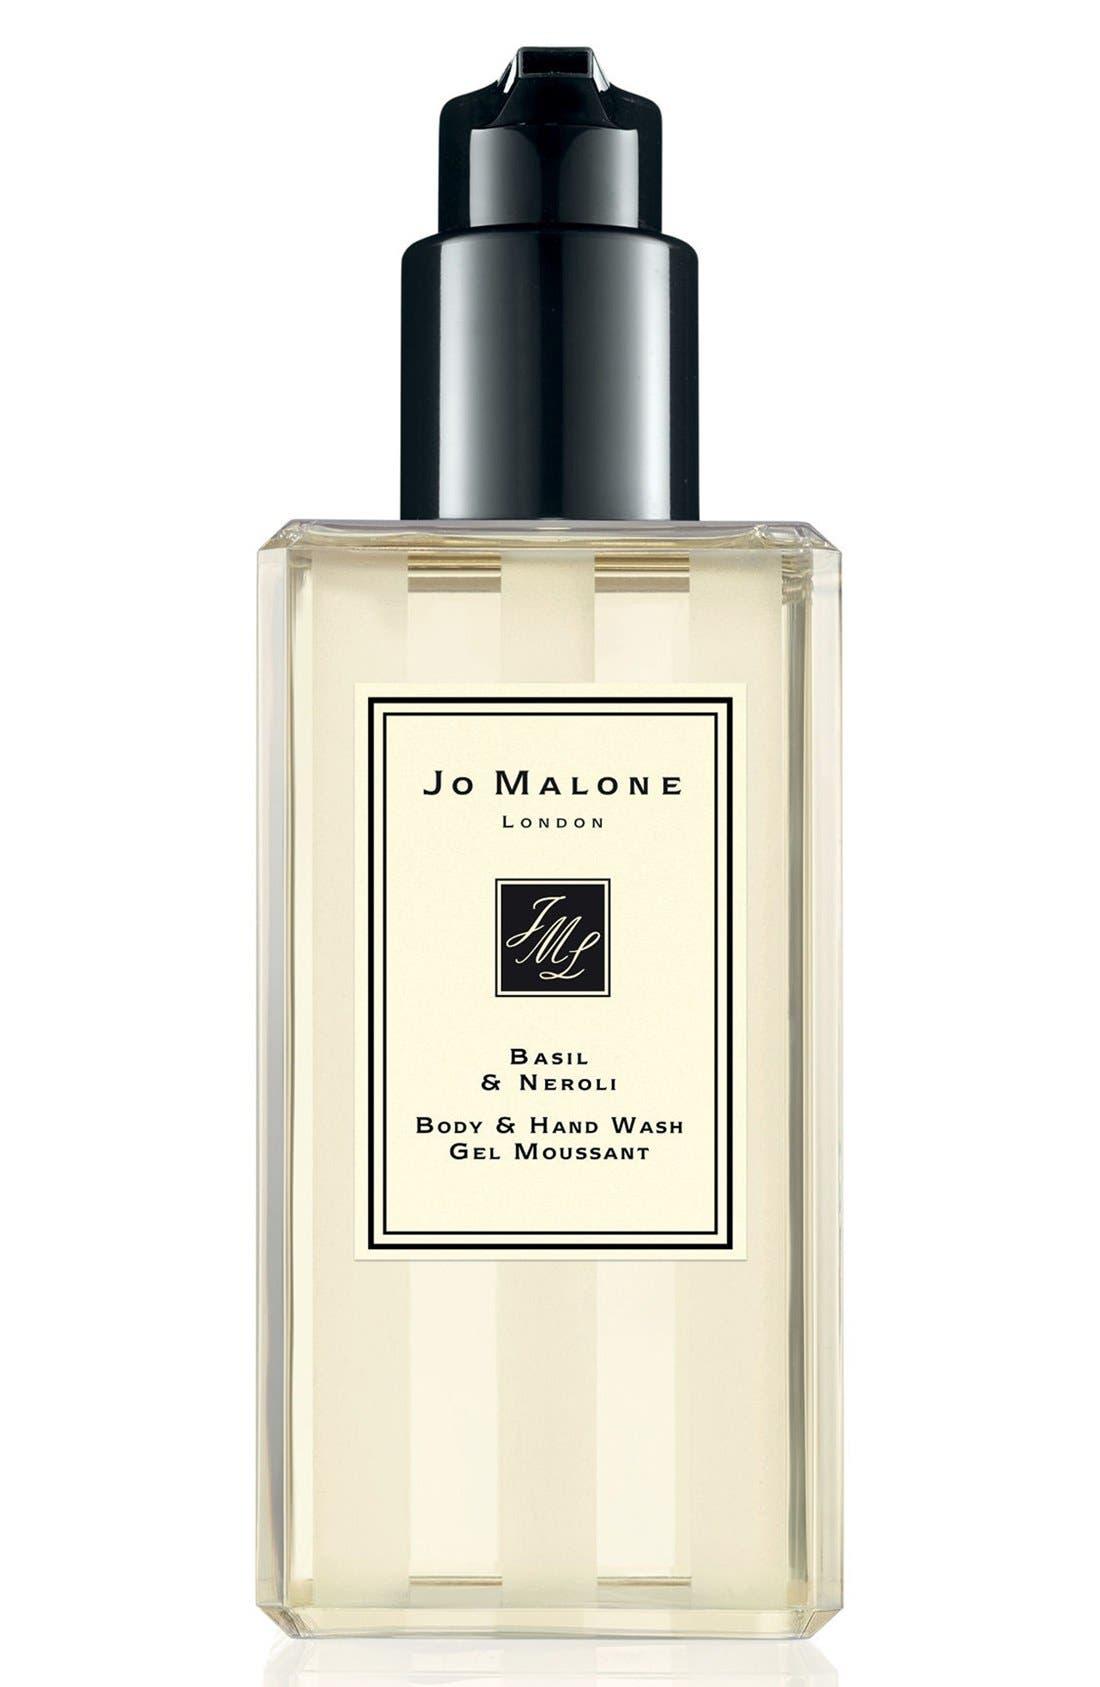 Jo Malone London™ Basil & Neroli Body & Hand Wash